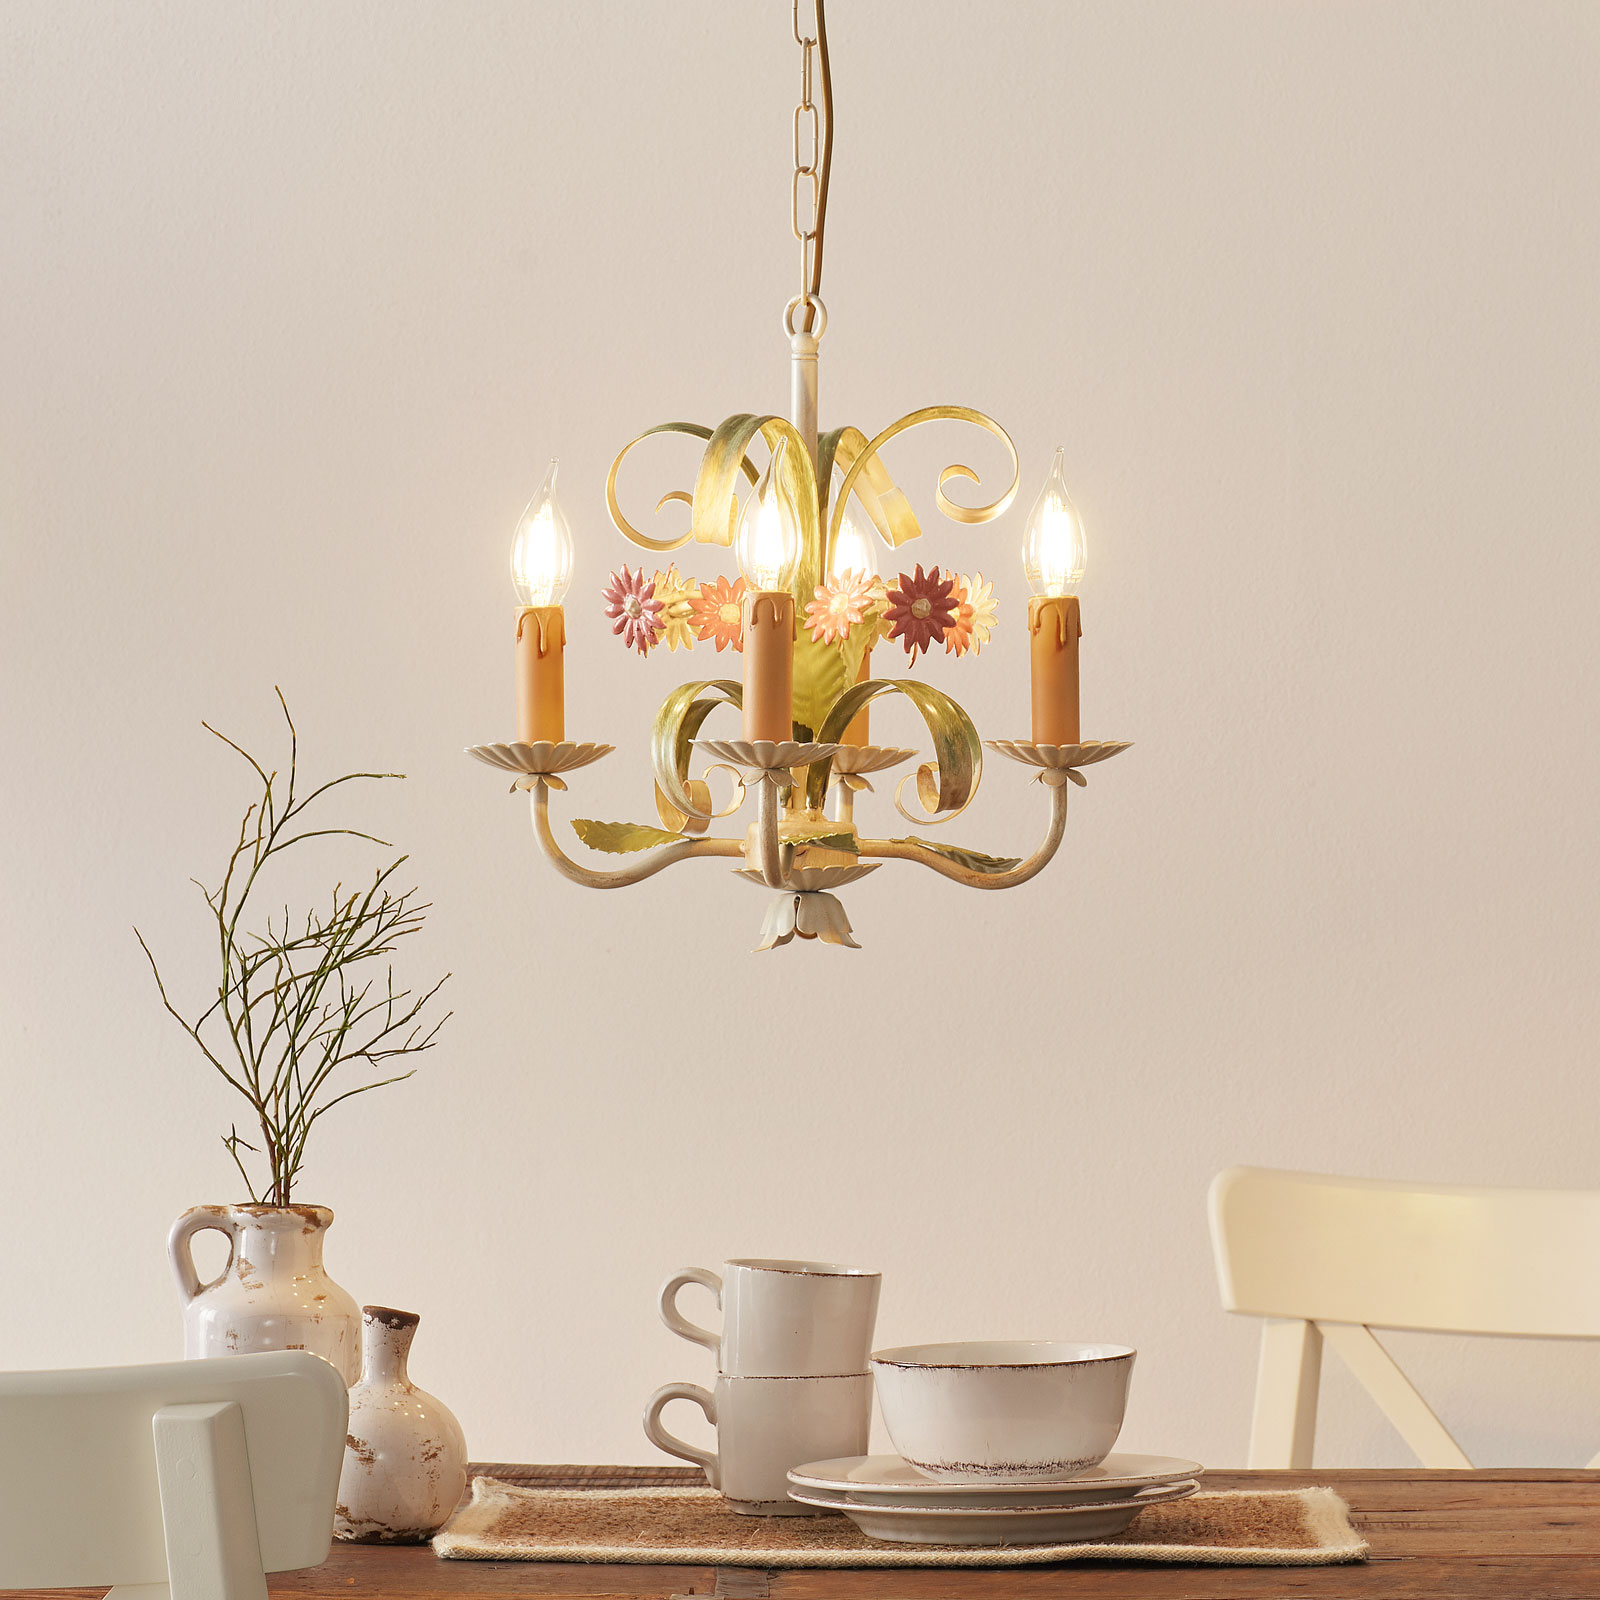 4-lamps kroonluchter Toscana, florentijns